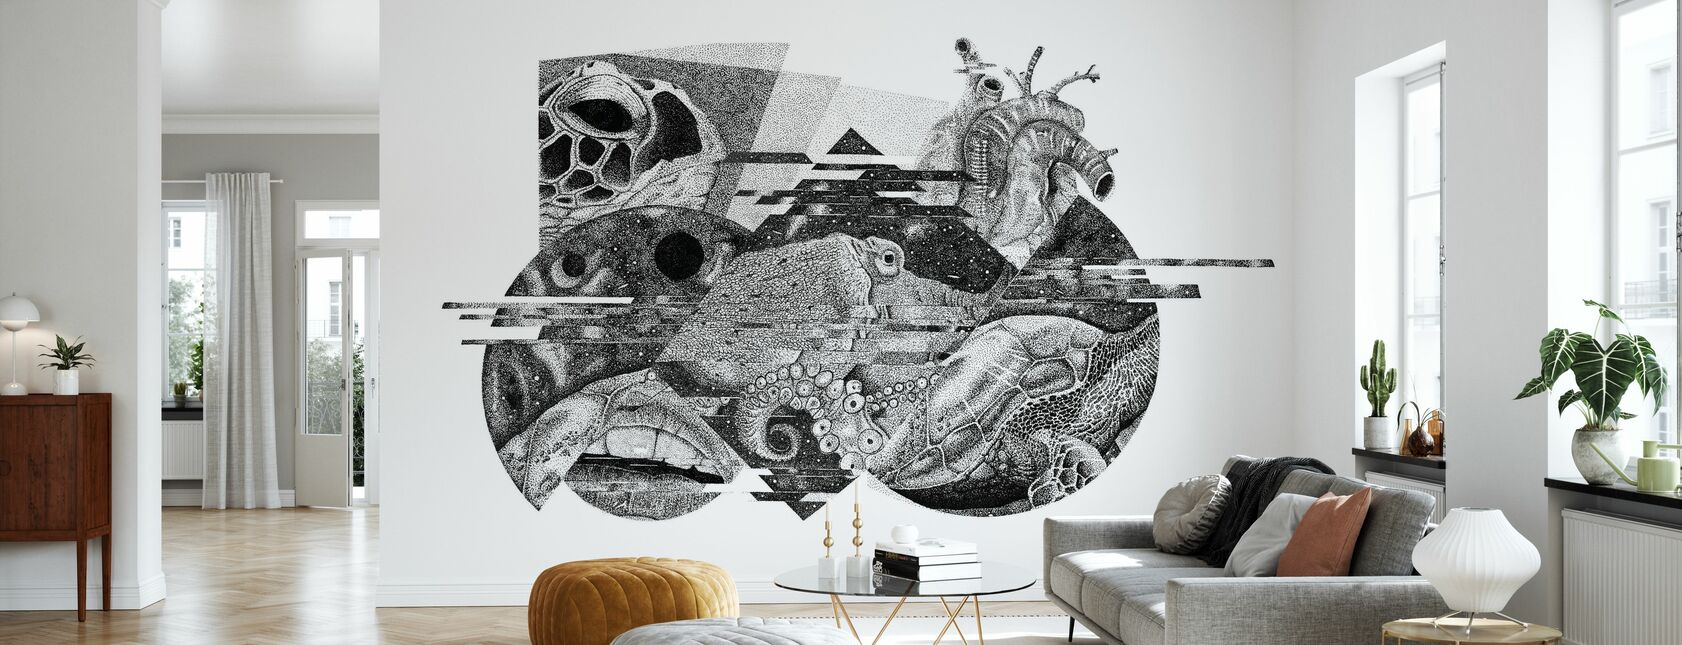 Interrupted Universe VI - Wallpaper - Living Room